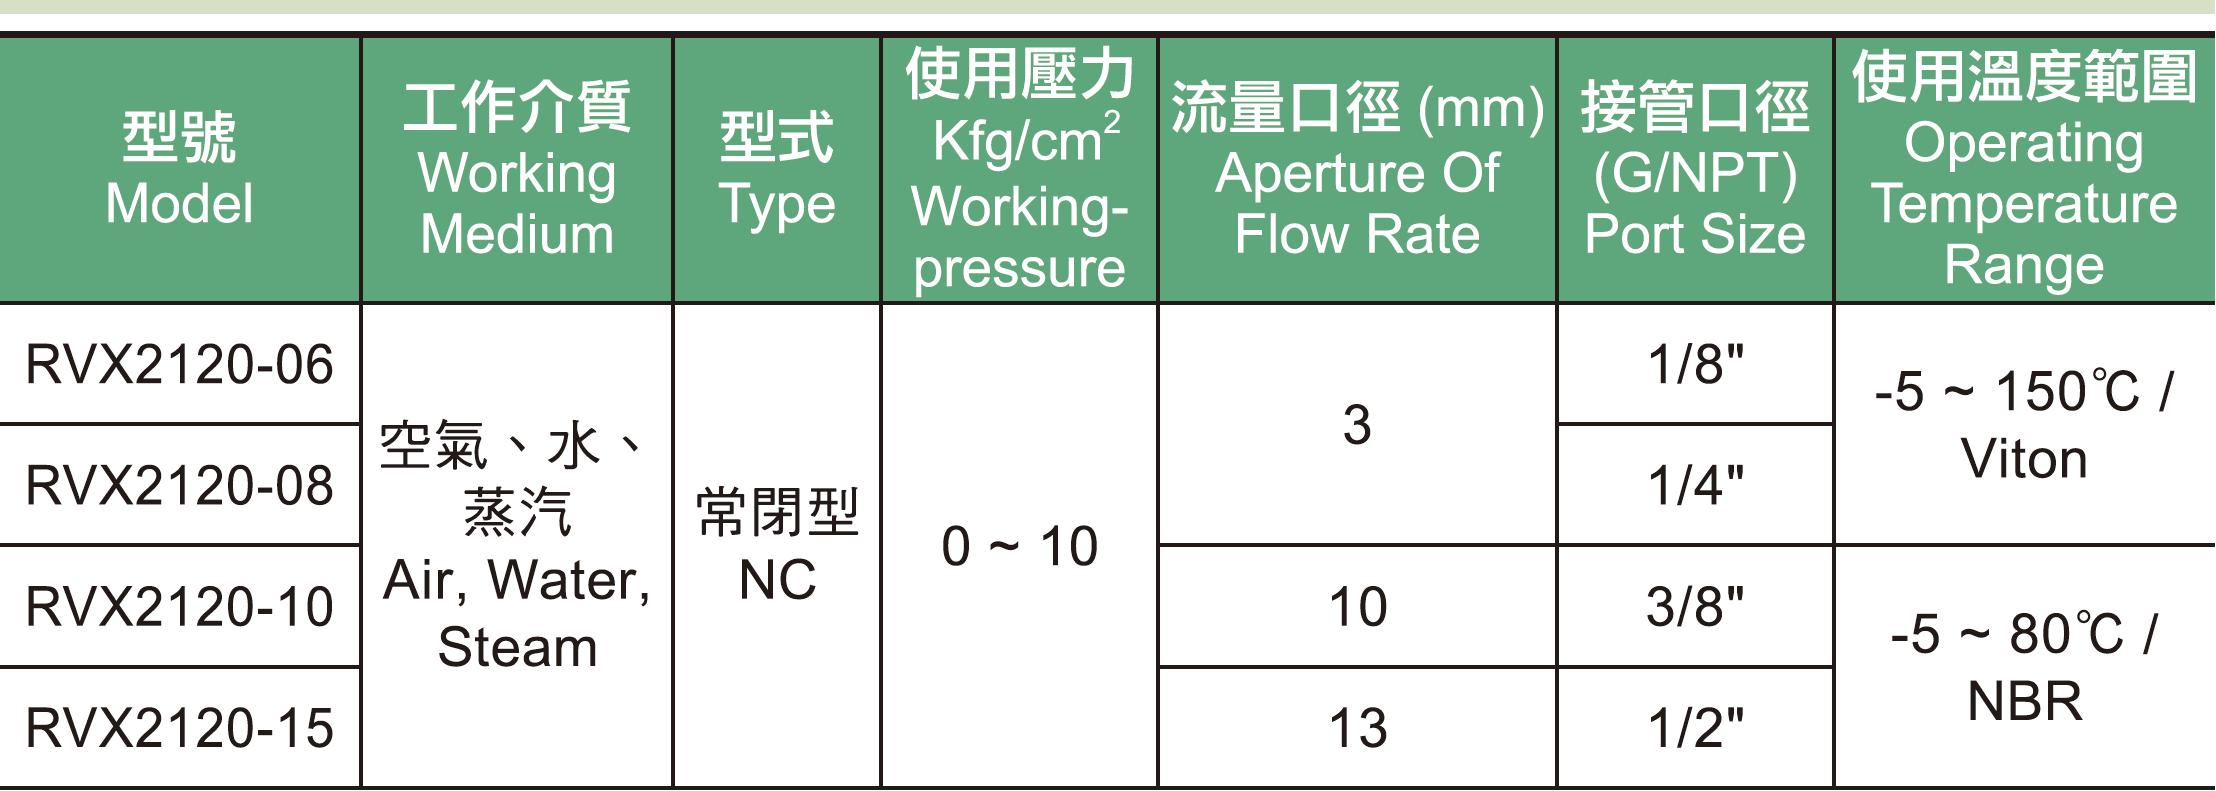 01.RVX系列電磁閥規格表.jpg